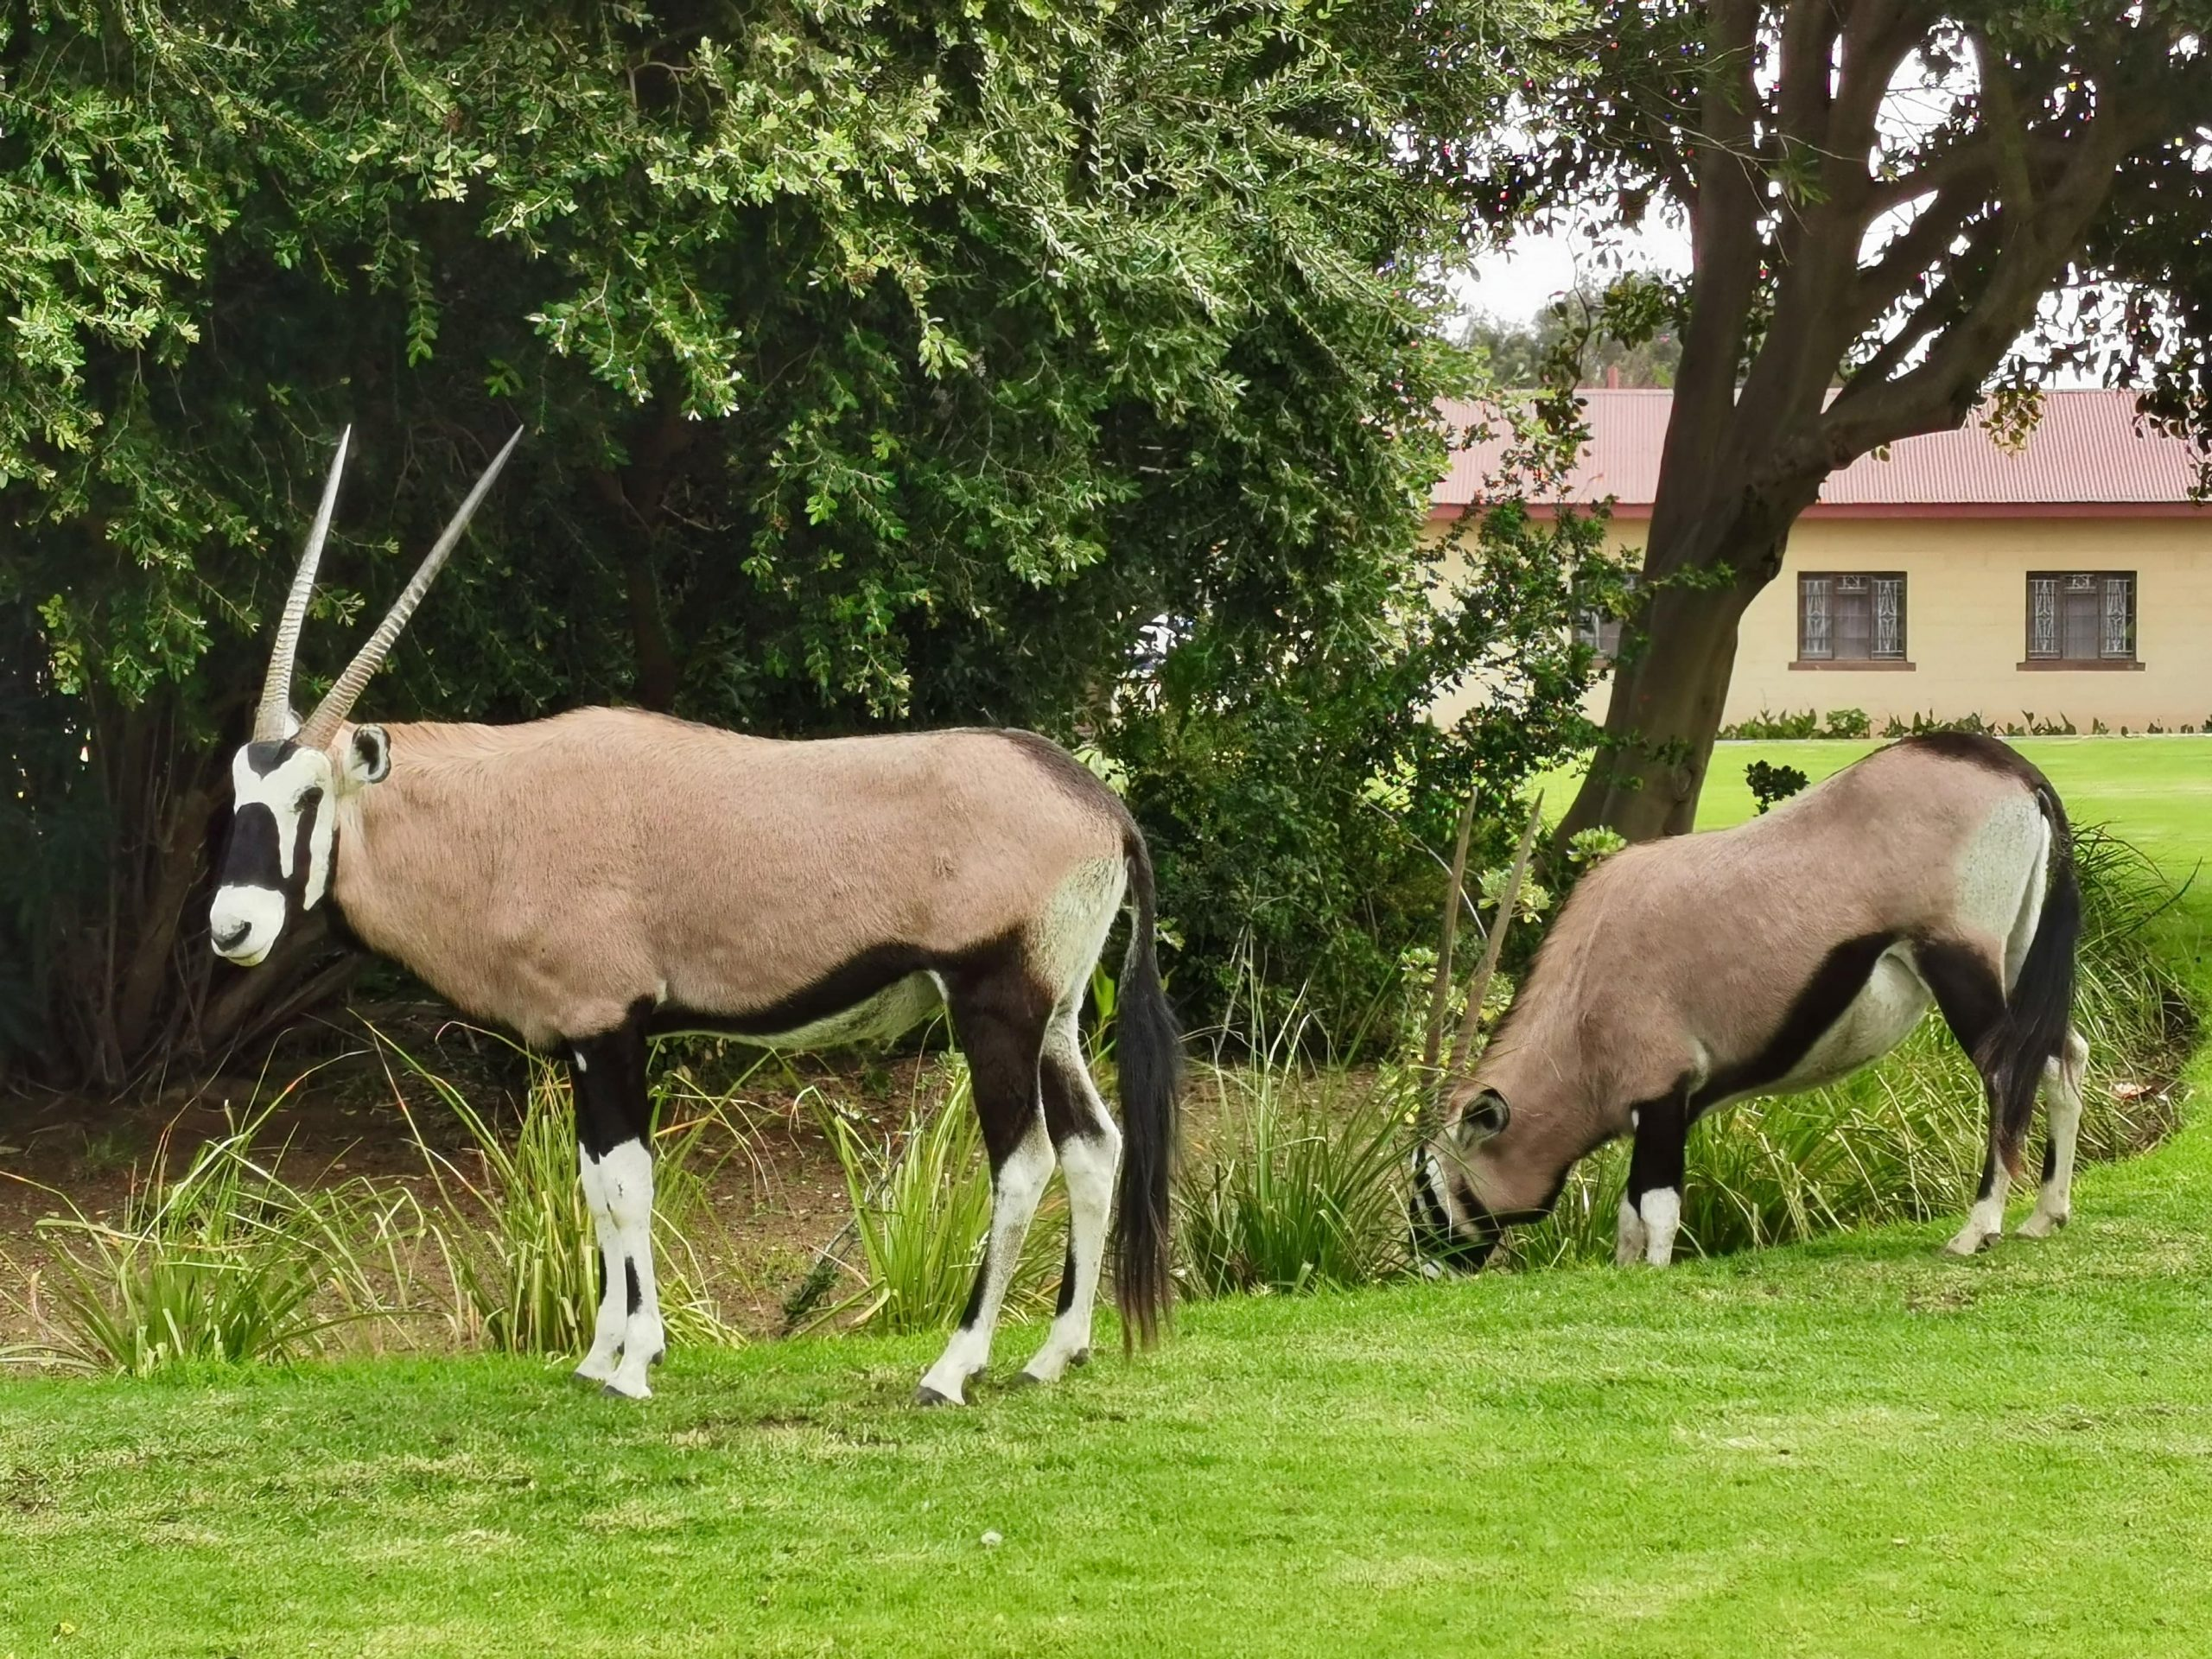 Oryx roaming Oranjemund's streets